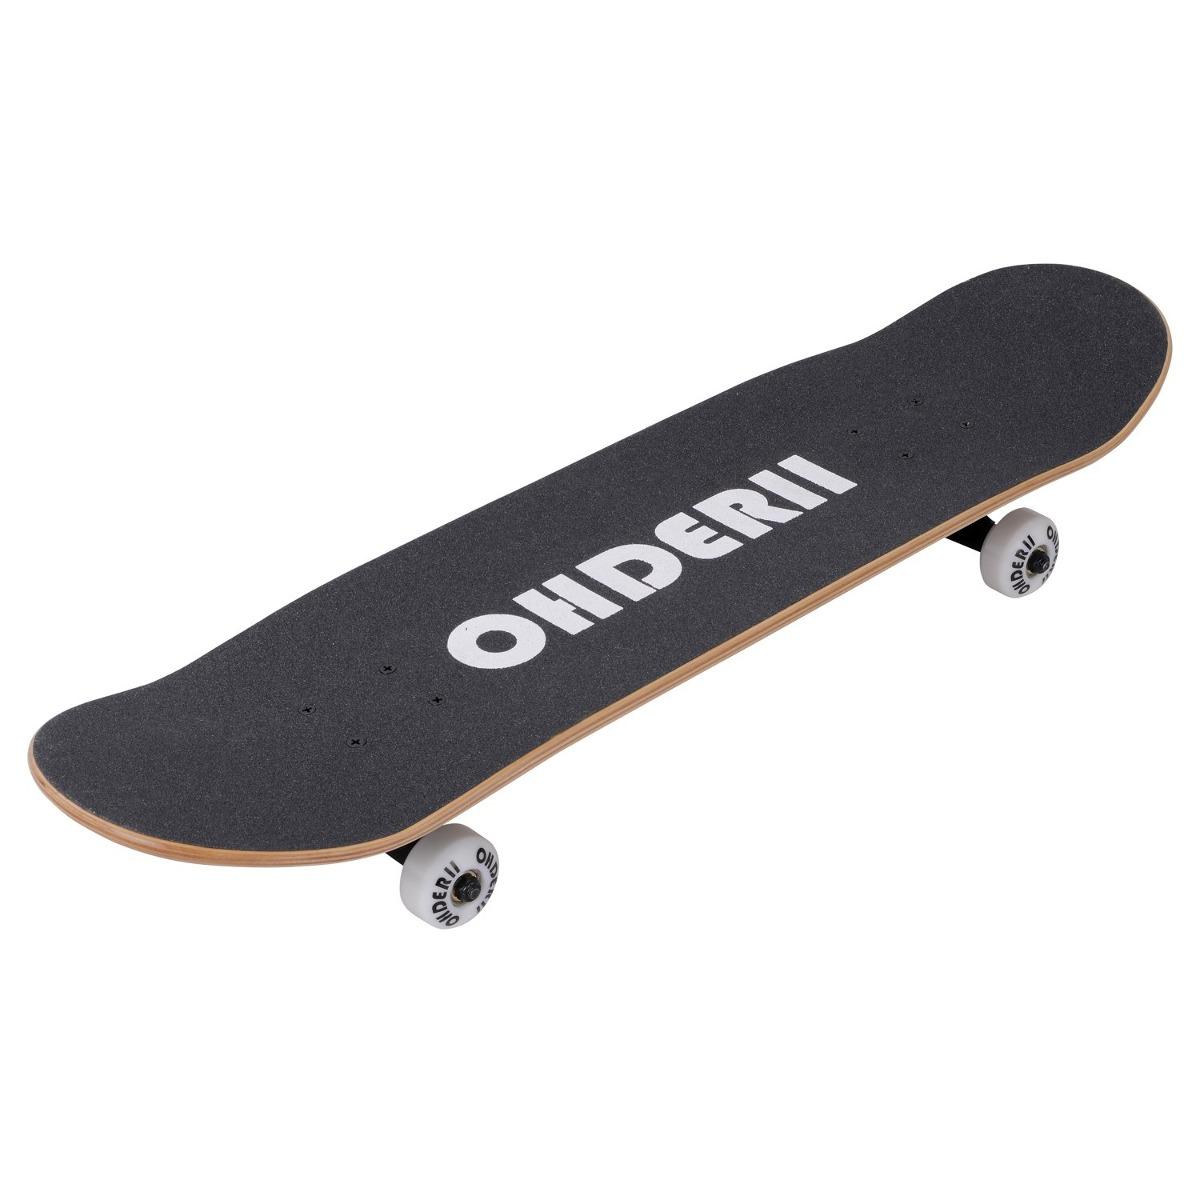 Monopatín Skate De Ohderii Crucero Skateboard De 31 -inchx -   5.031 ... 3a597afa5cb